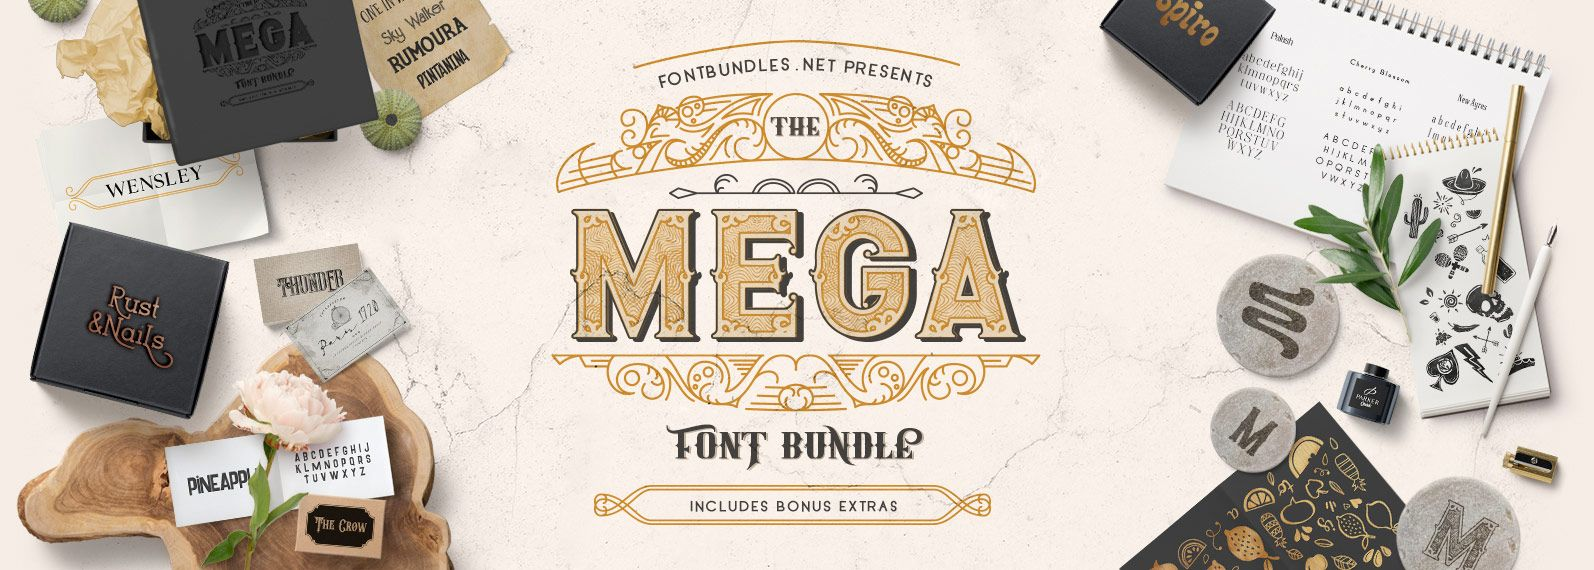 The Mega Font Bundle Cover Font bundles, Graphic design